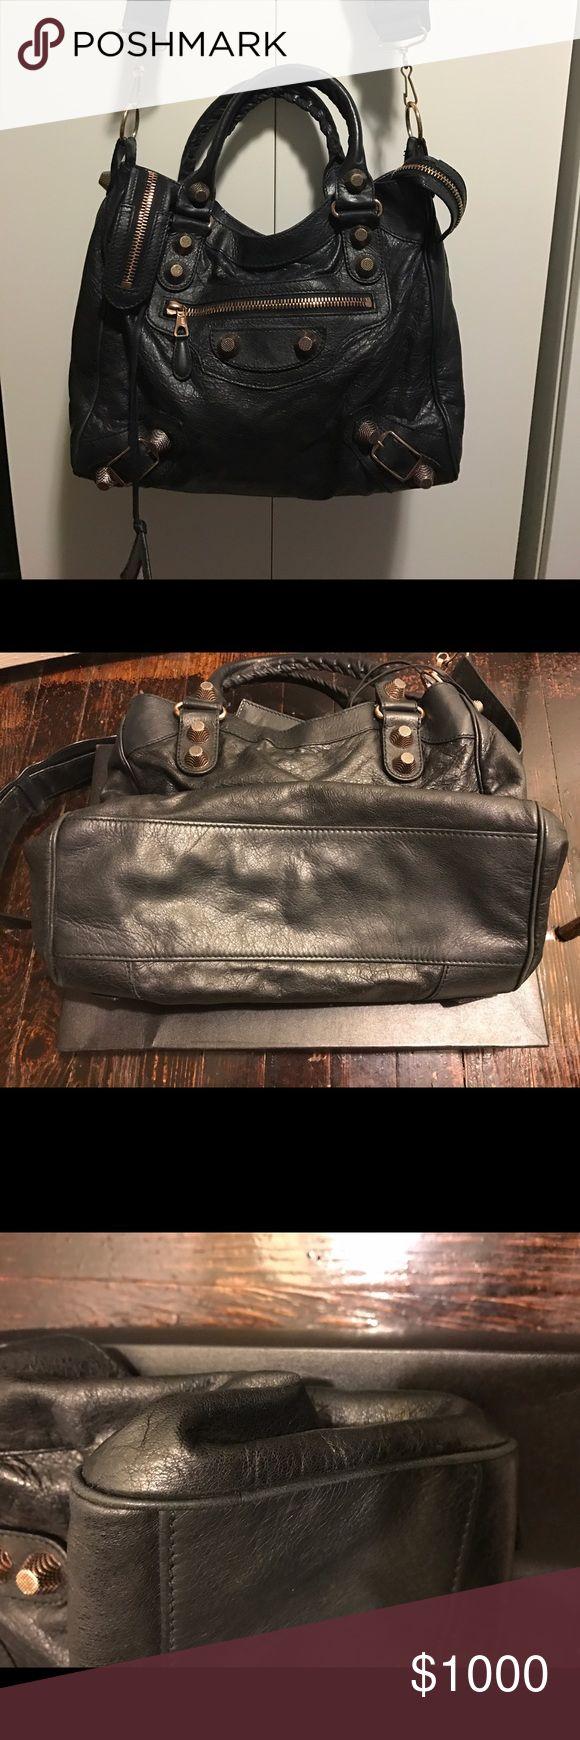 Extra pics of balenciaga velo bag Extra pics of balenciaga velo bag Balenciaga Bags Shoulder Bags